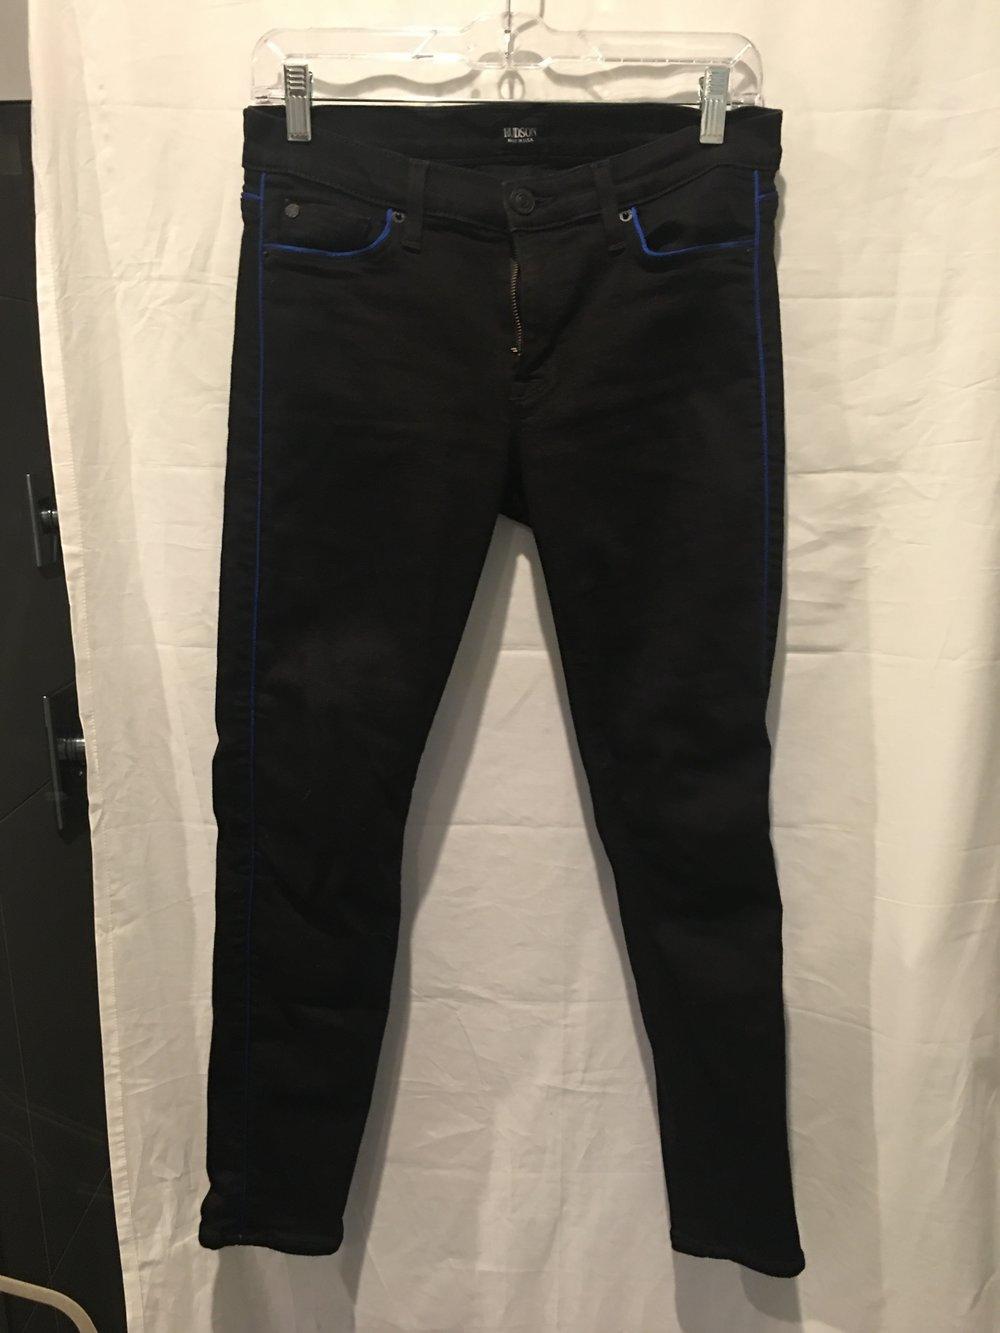 Black Jeans w Blue Piping.jpg